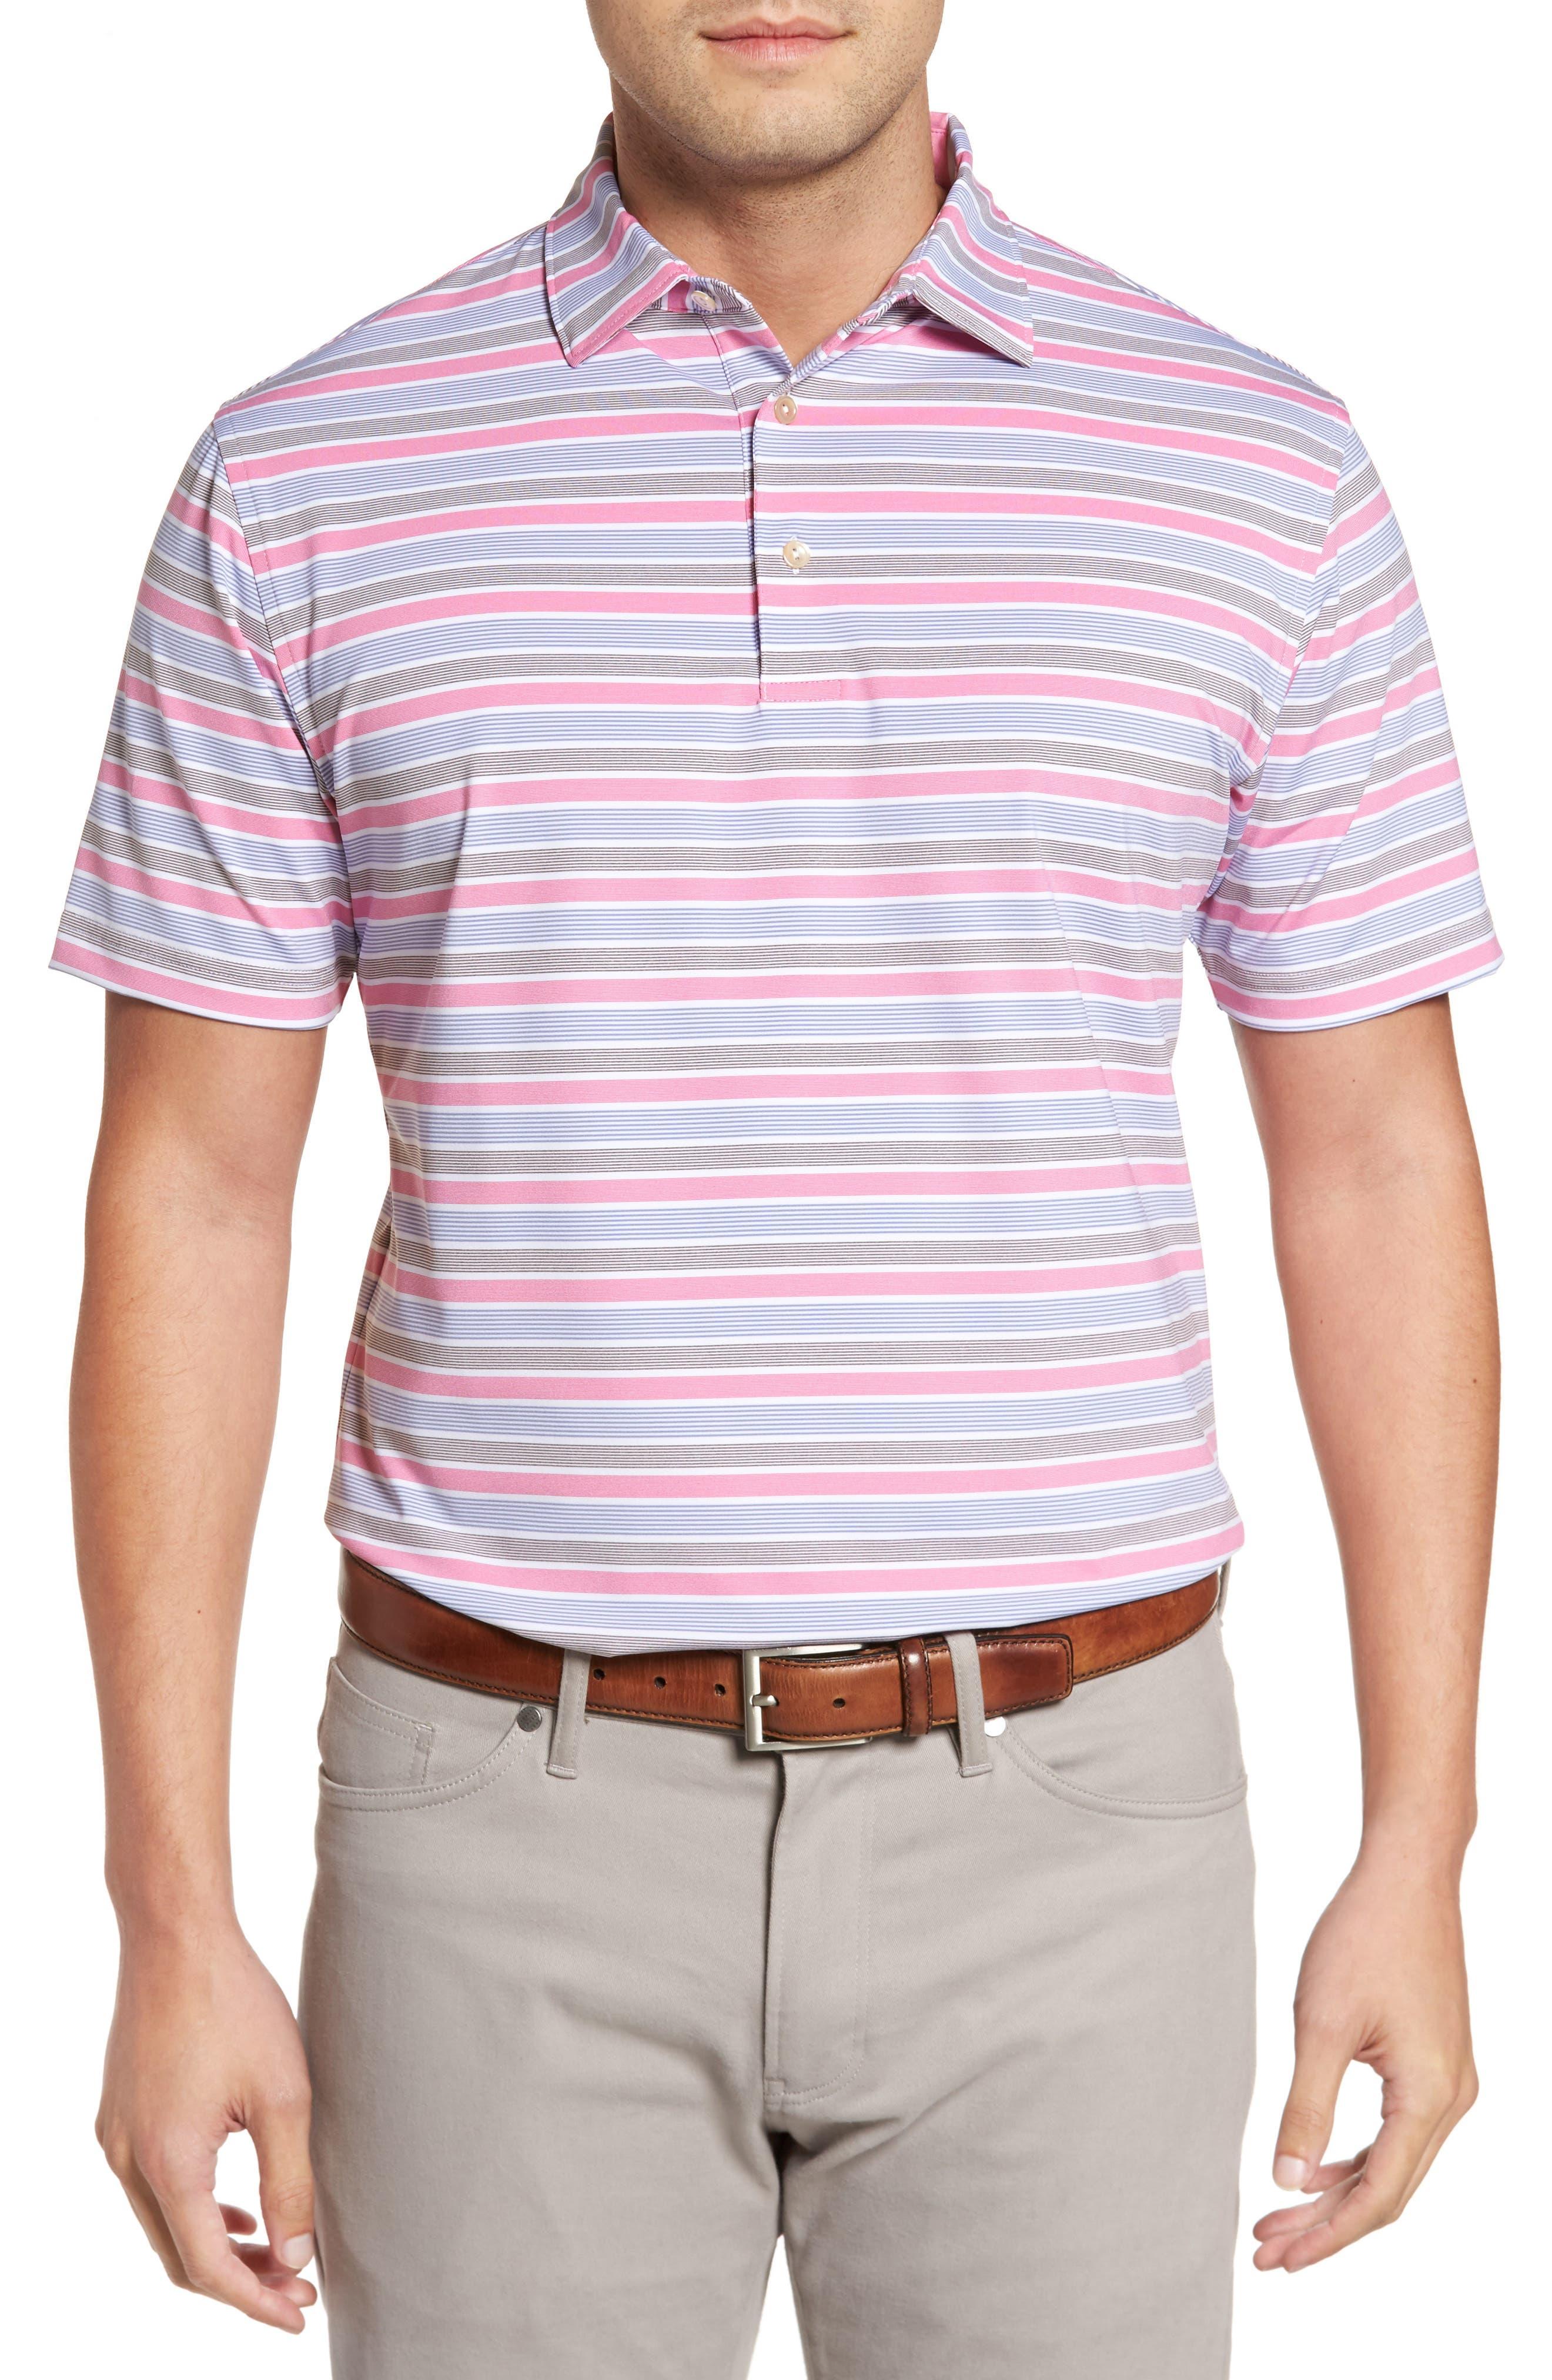 Peter Millar Blount Stripe Stretch Jersey Polo